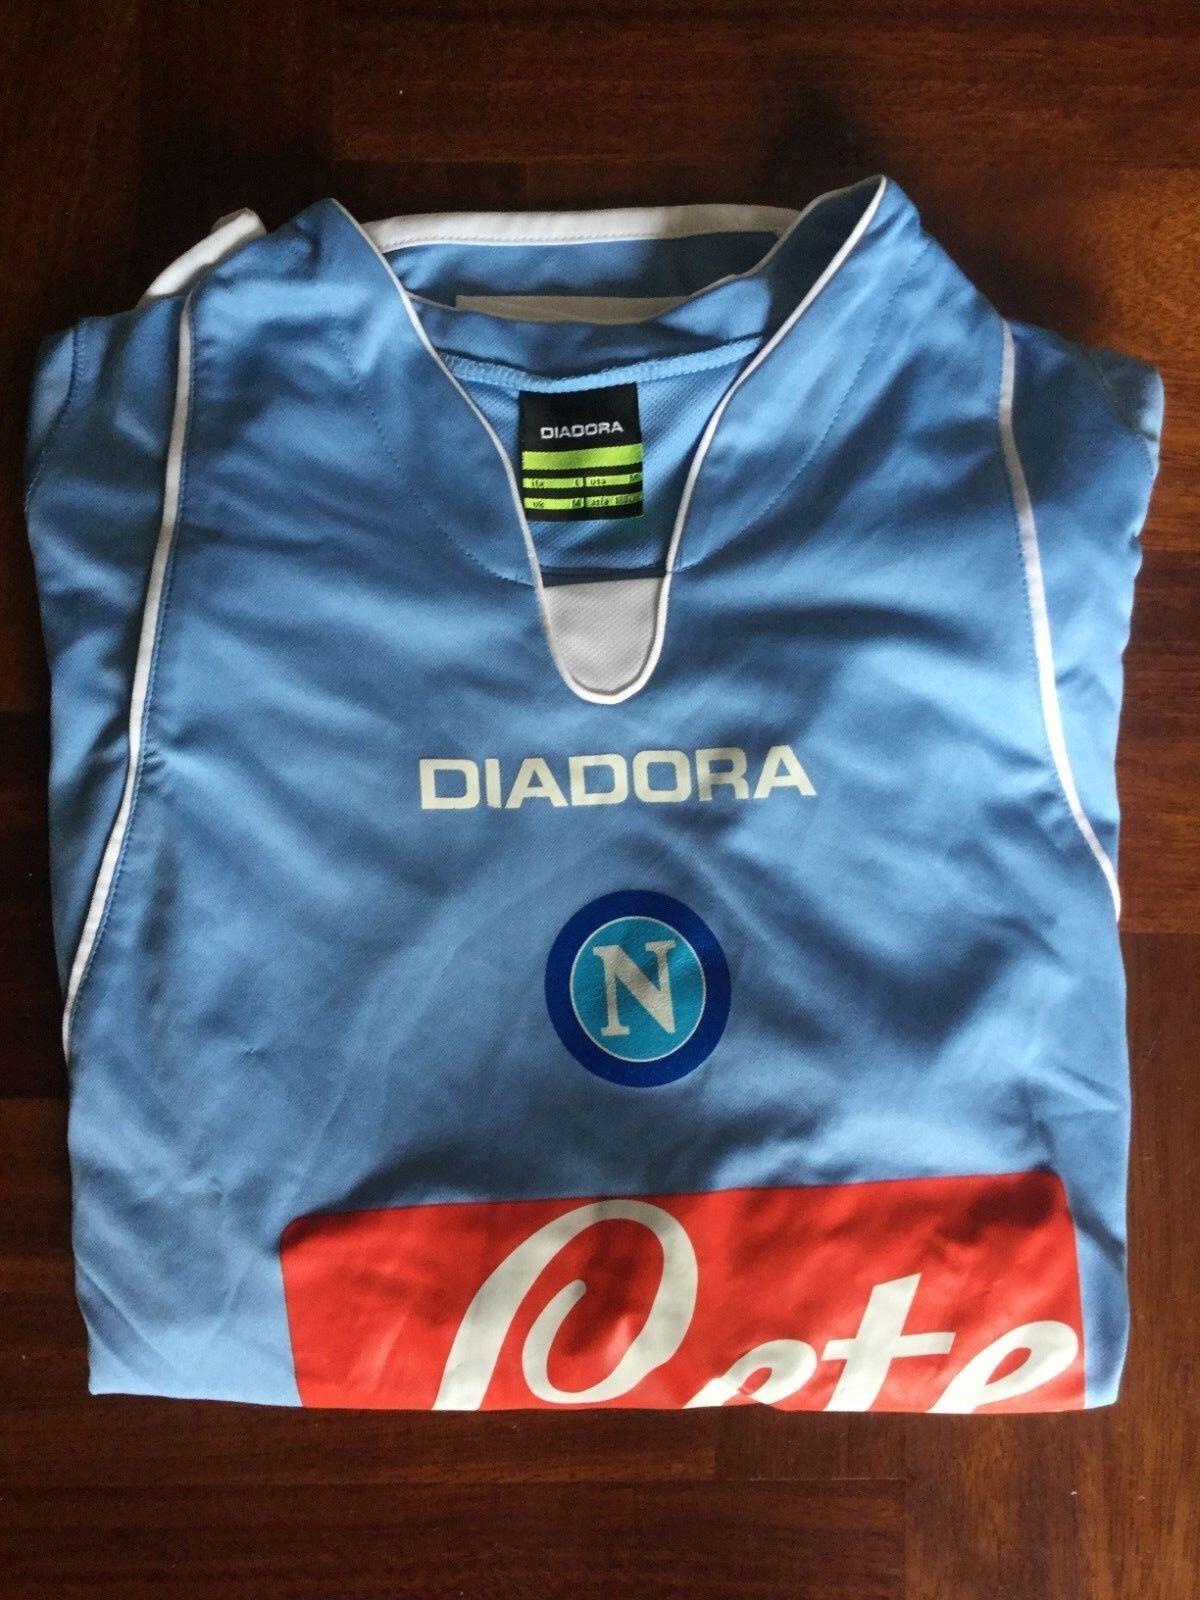 Maglia calcio diadora napoli lete pezzella football shirt jersey Talla L